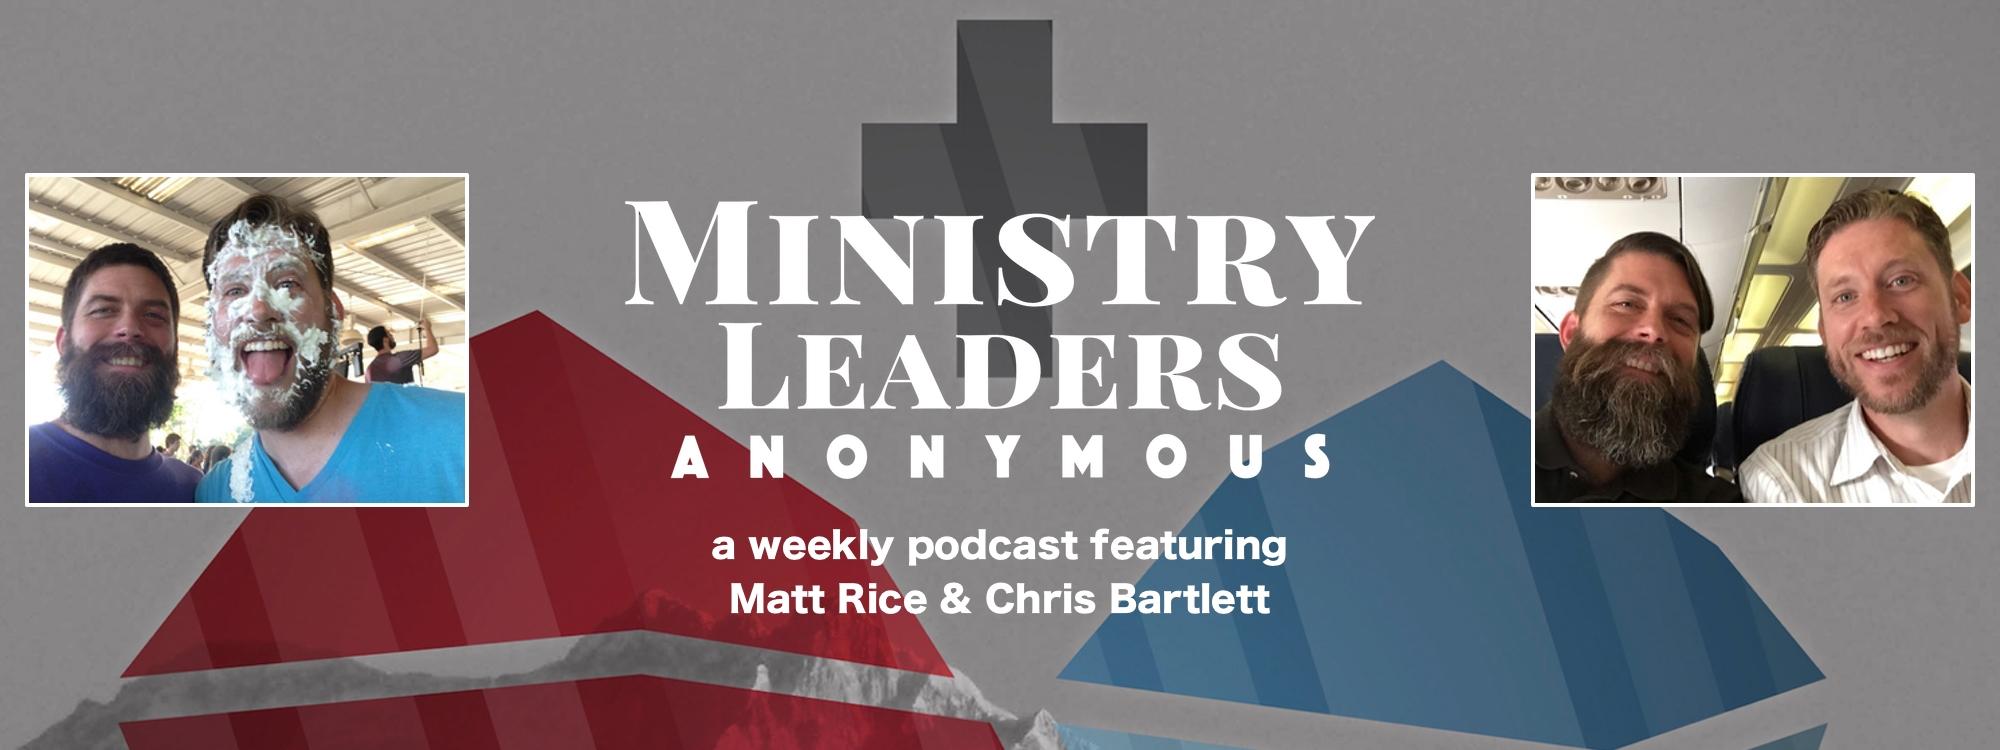 Ministry Leaders Anonymous, podcast, podcasting, catholic, chris bartlett, matt rice